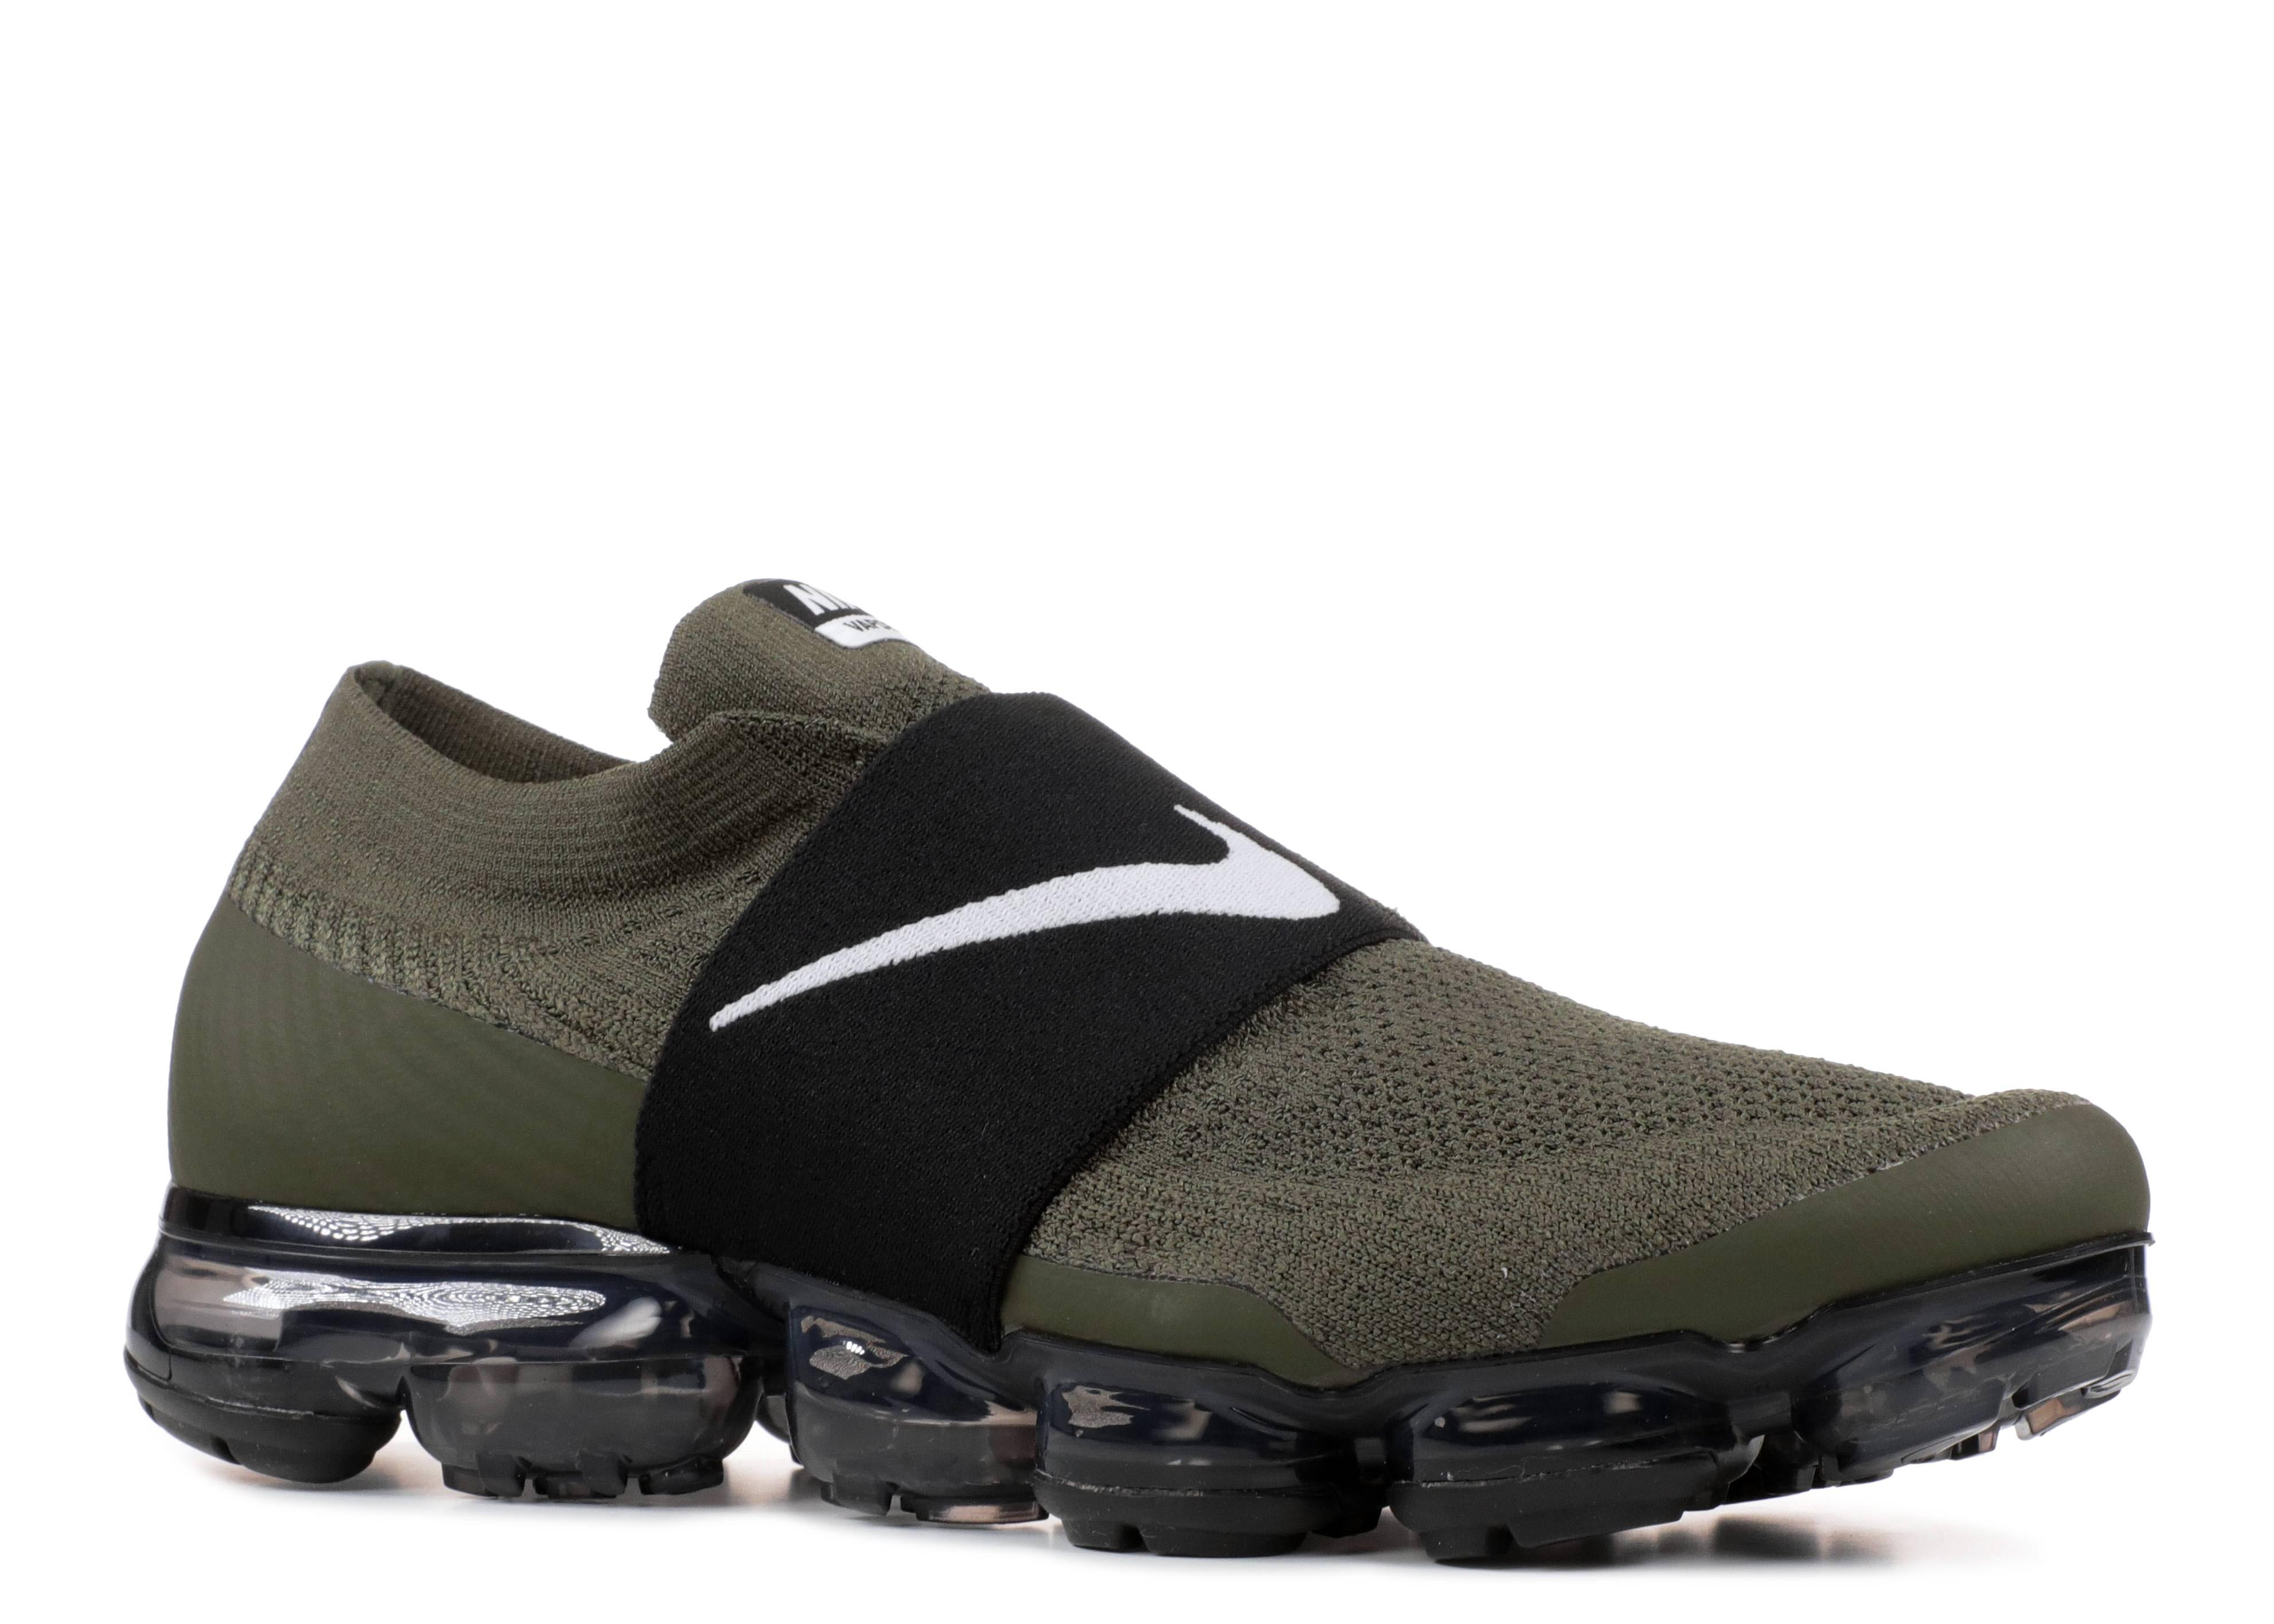 1599cfb718aa0 Wmns Nike Air Vapormax Fk Moc - Nike - aa4155 300 - cargo khaki white-black